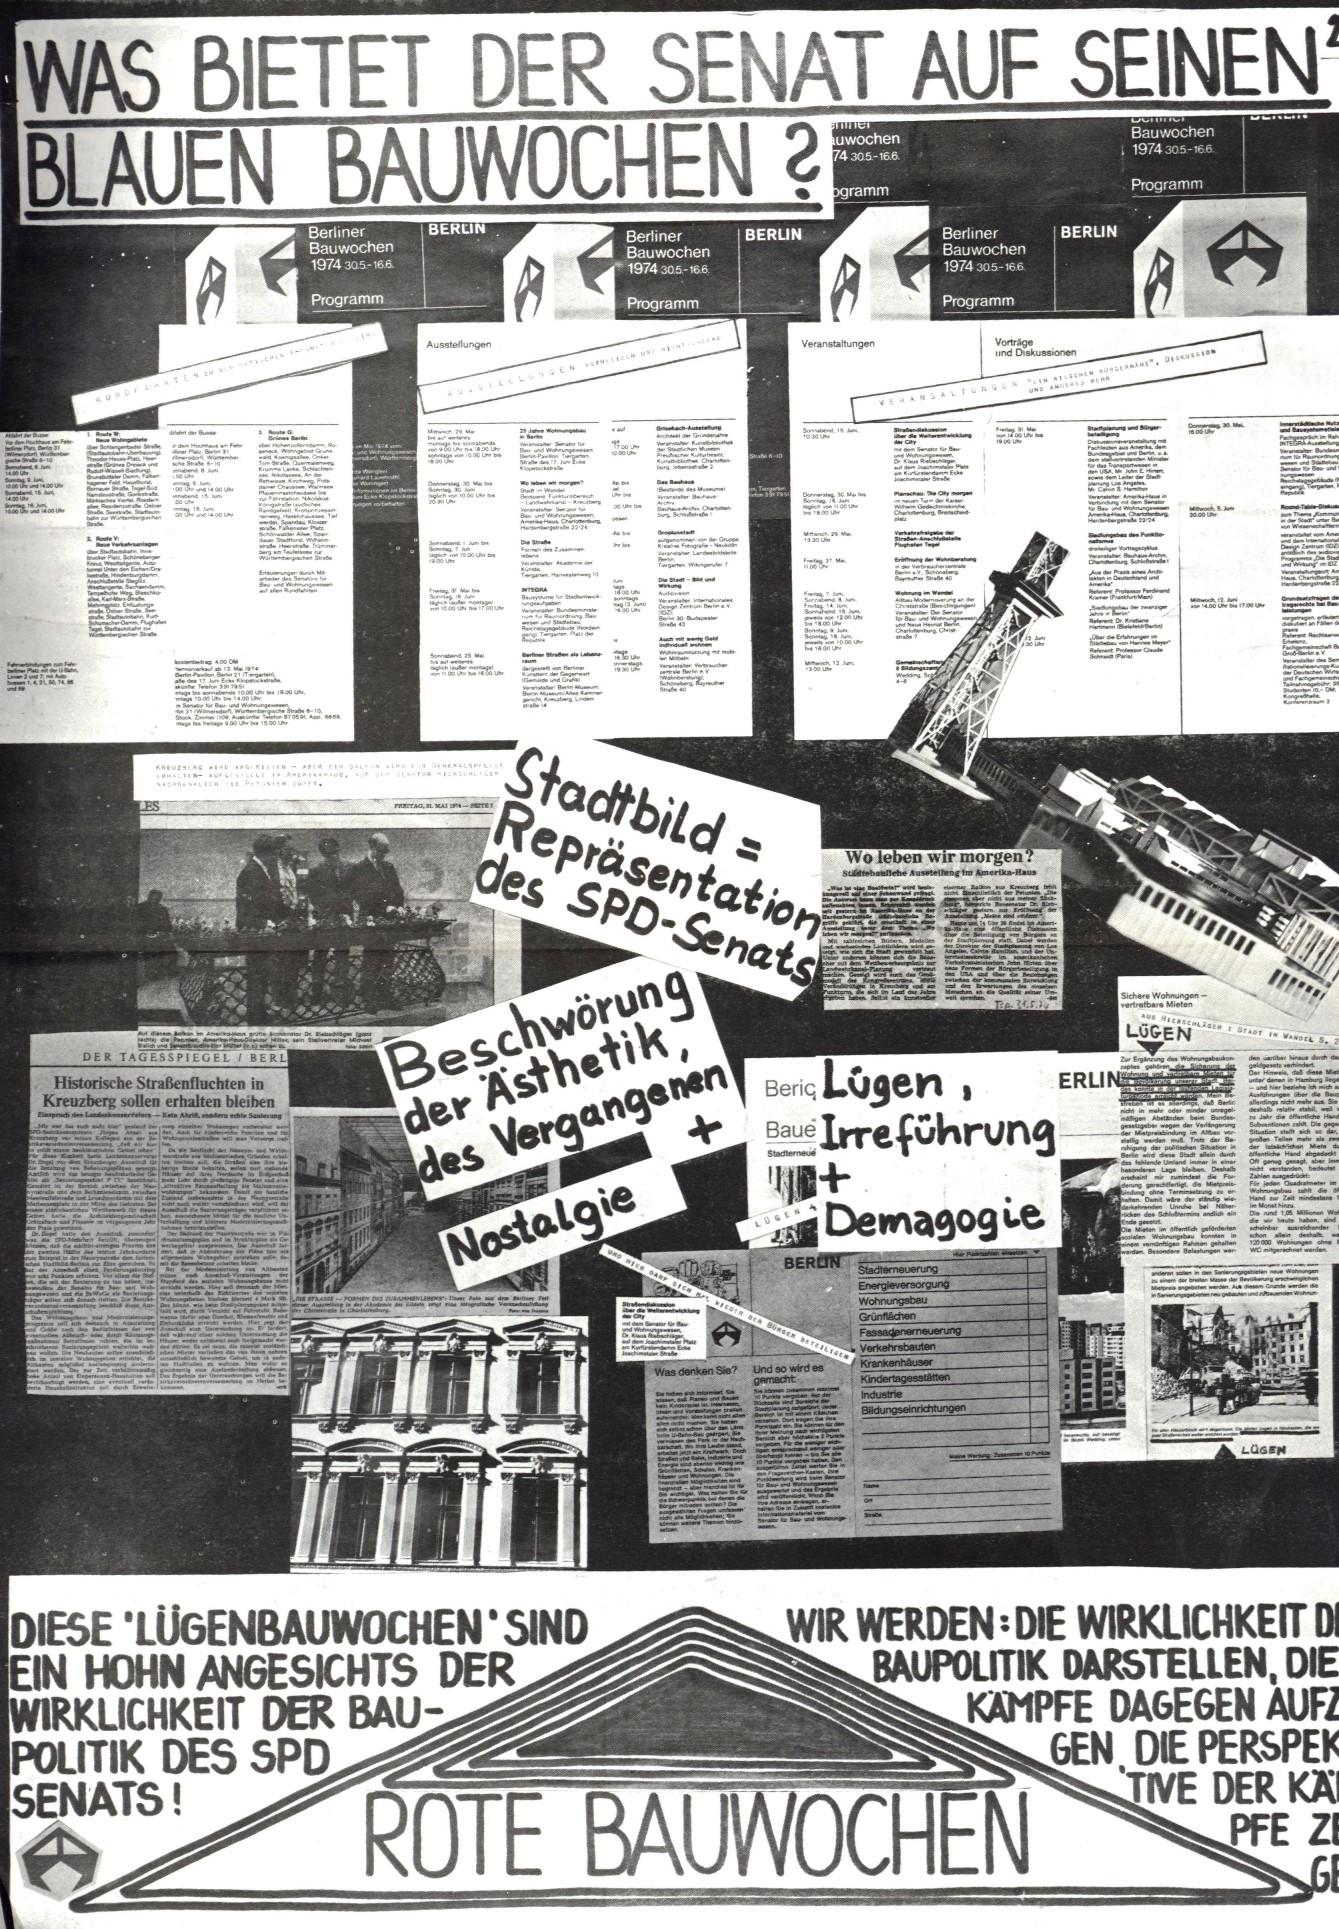 Berlin_KSV_1974_Rote_Bauwochen_11